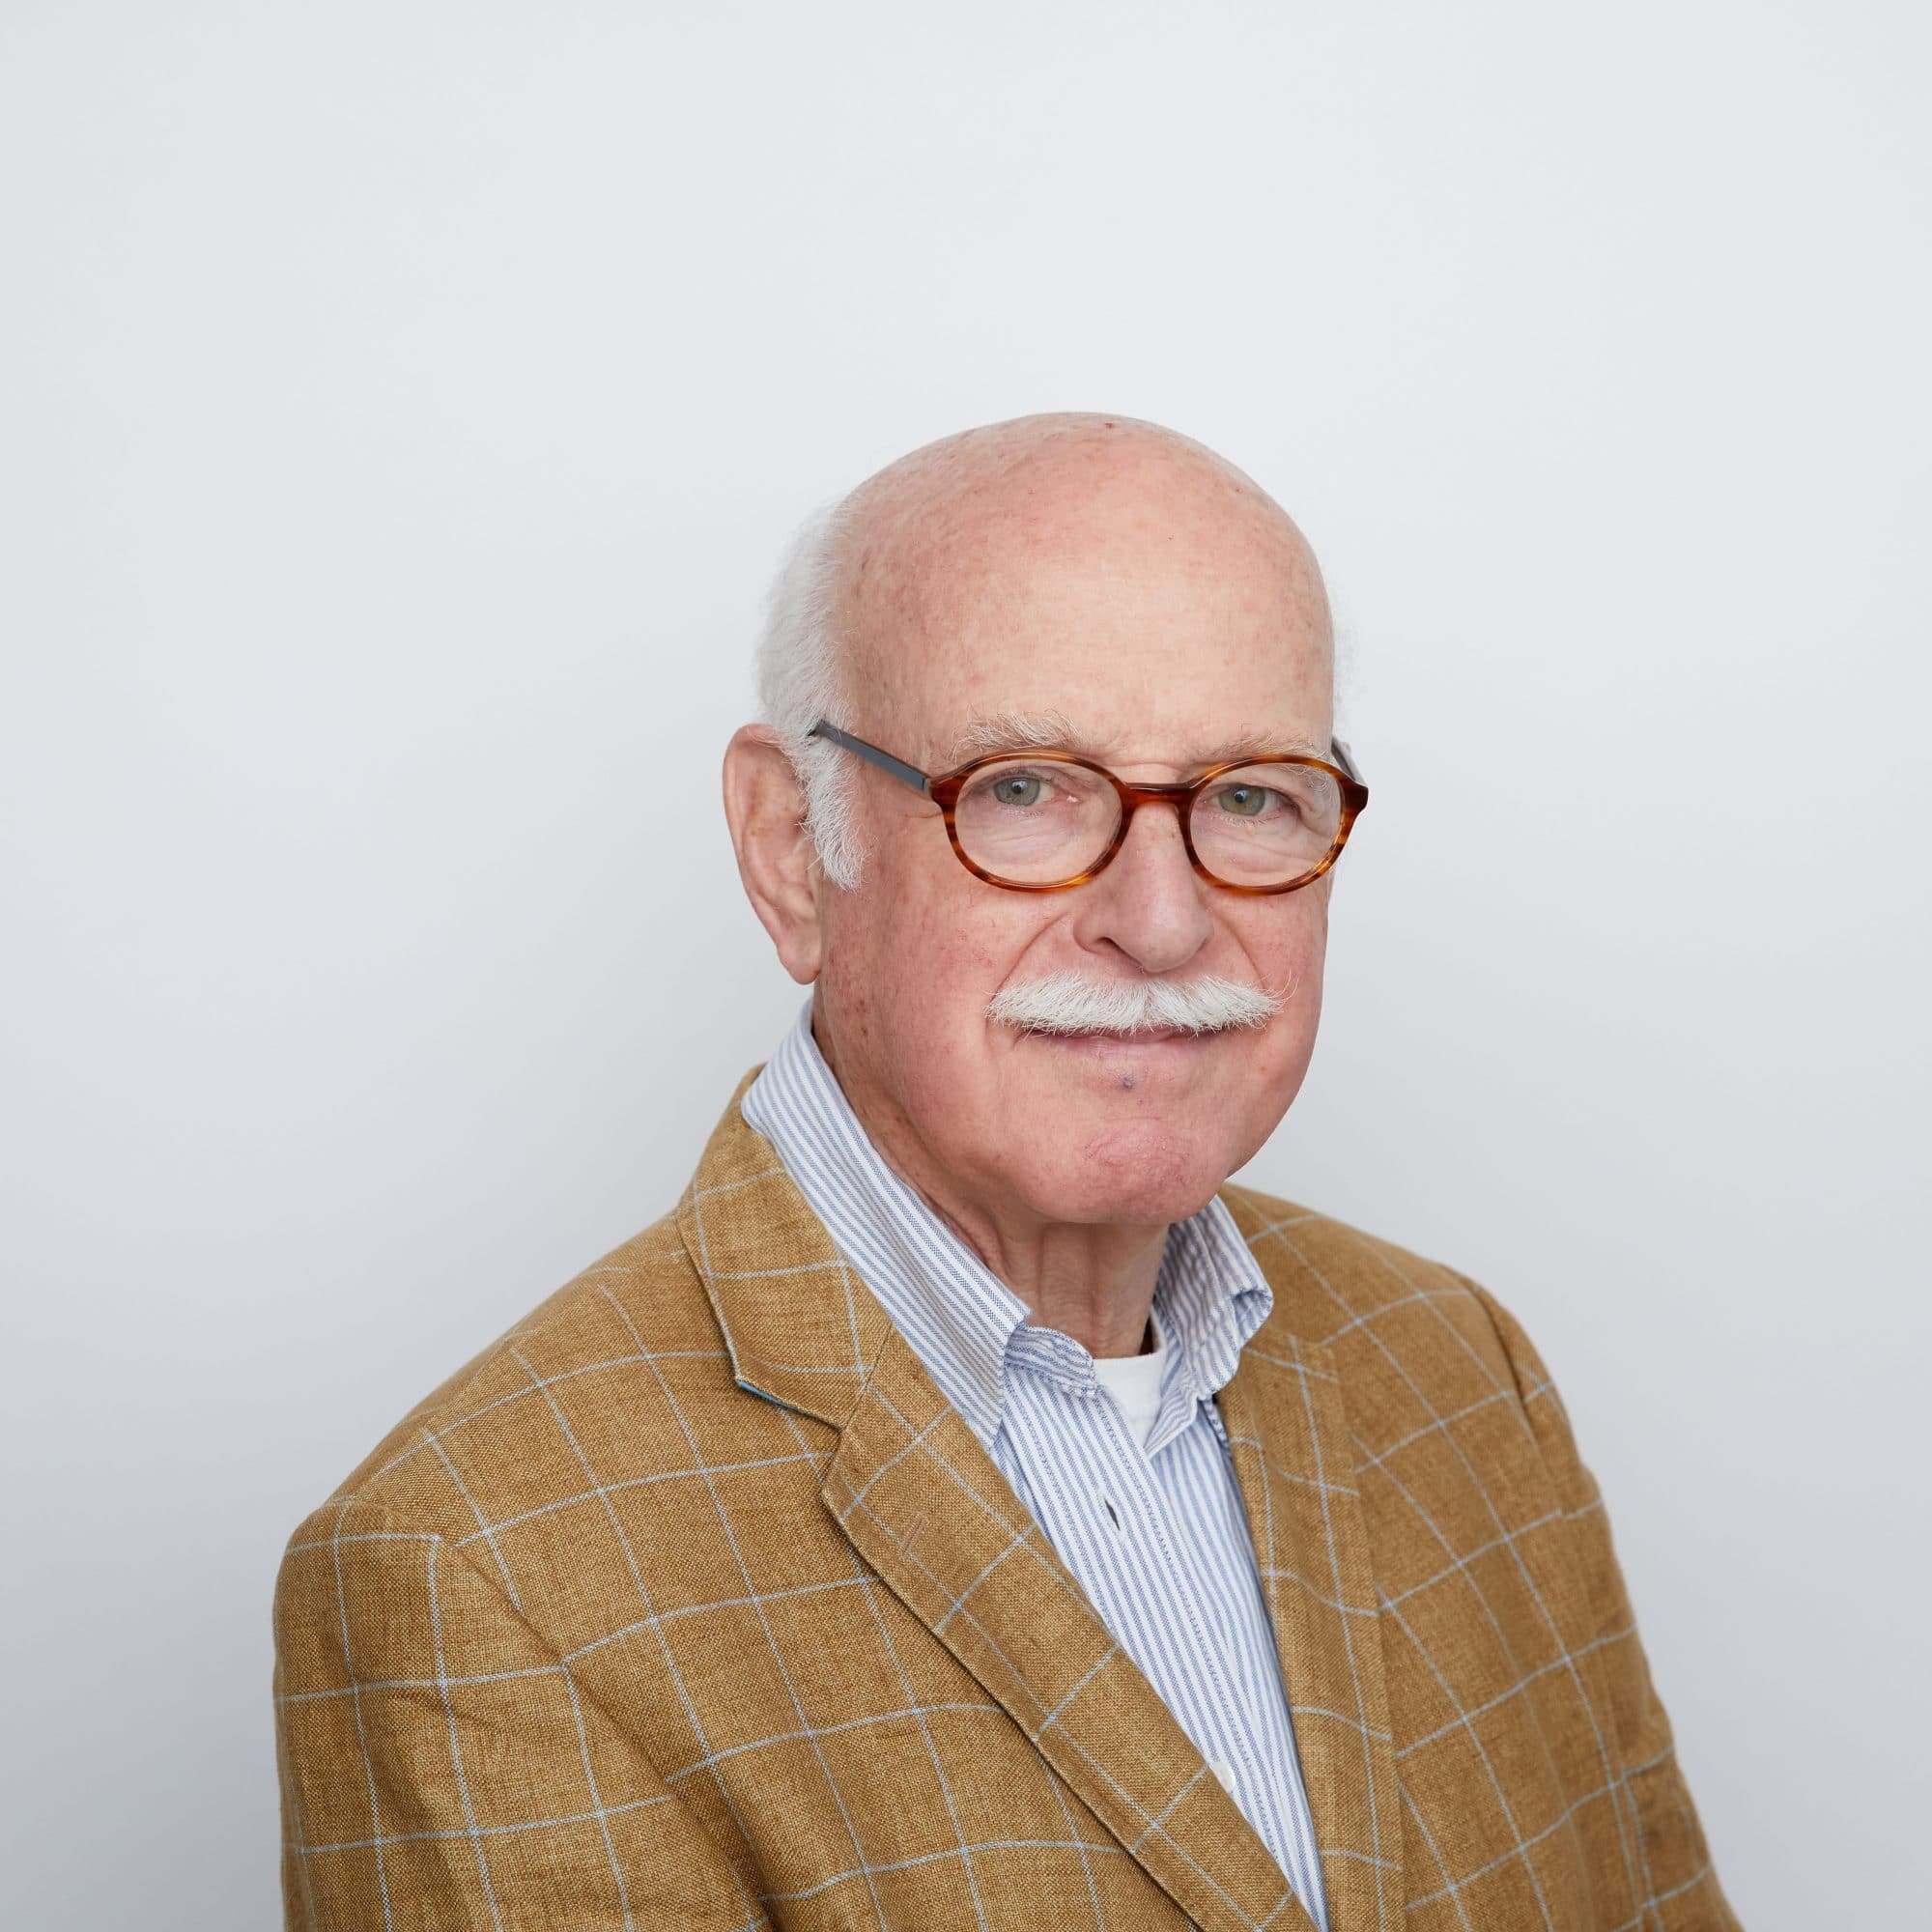 Matthijs F. Reuder